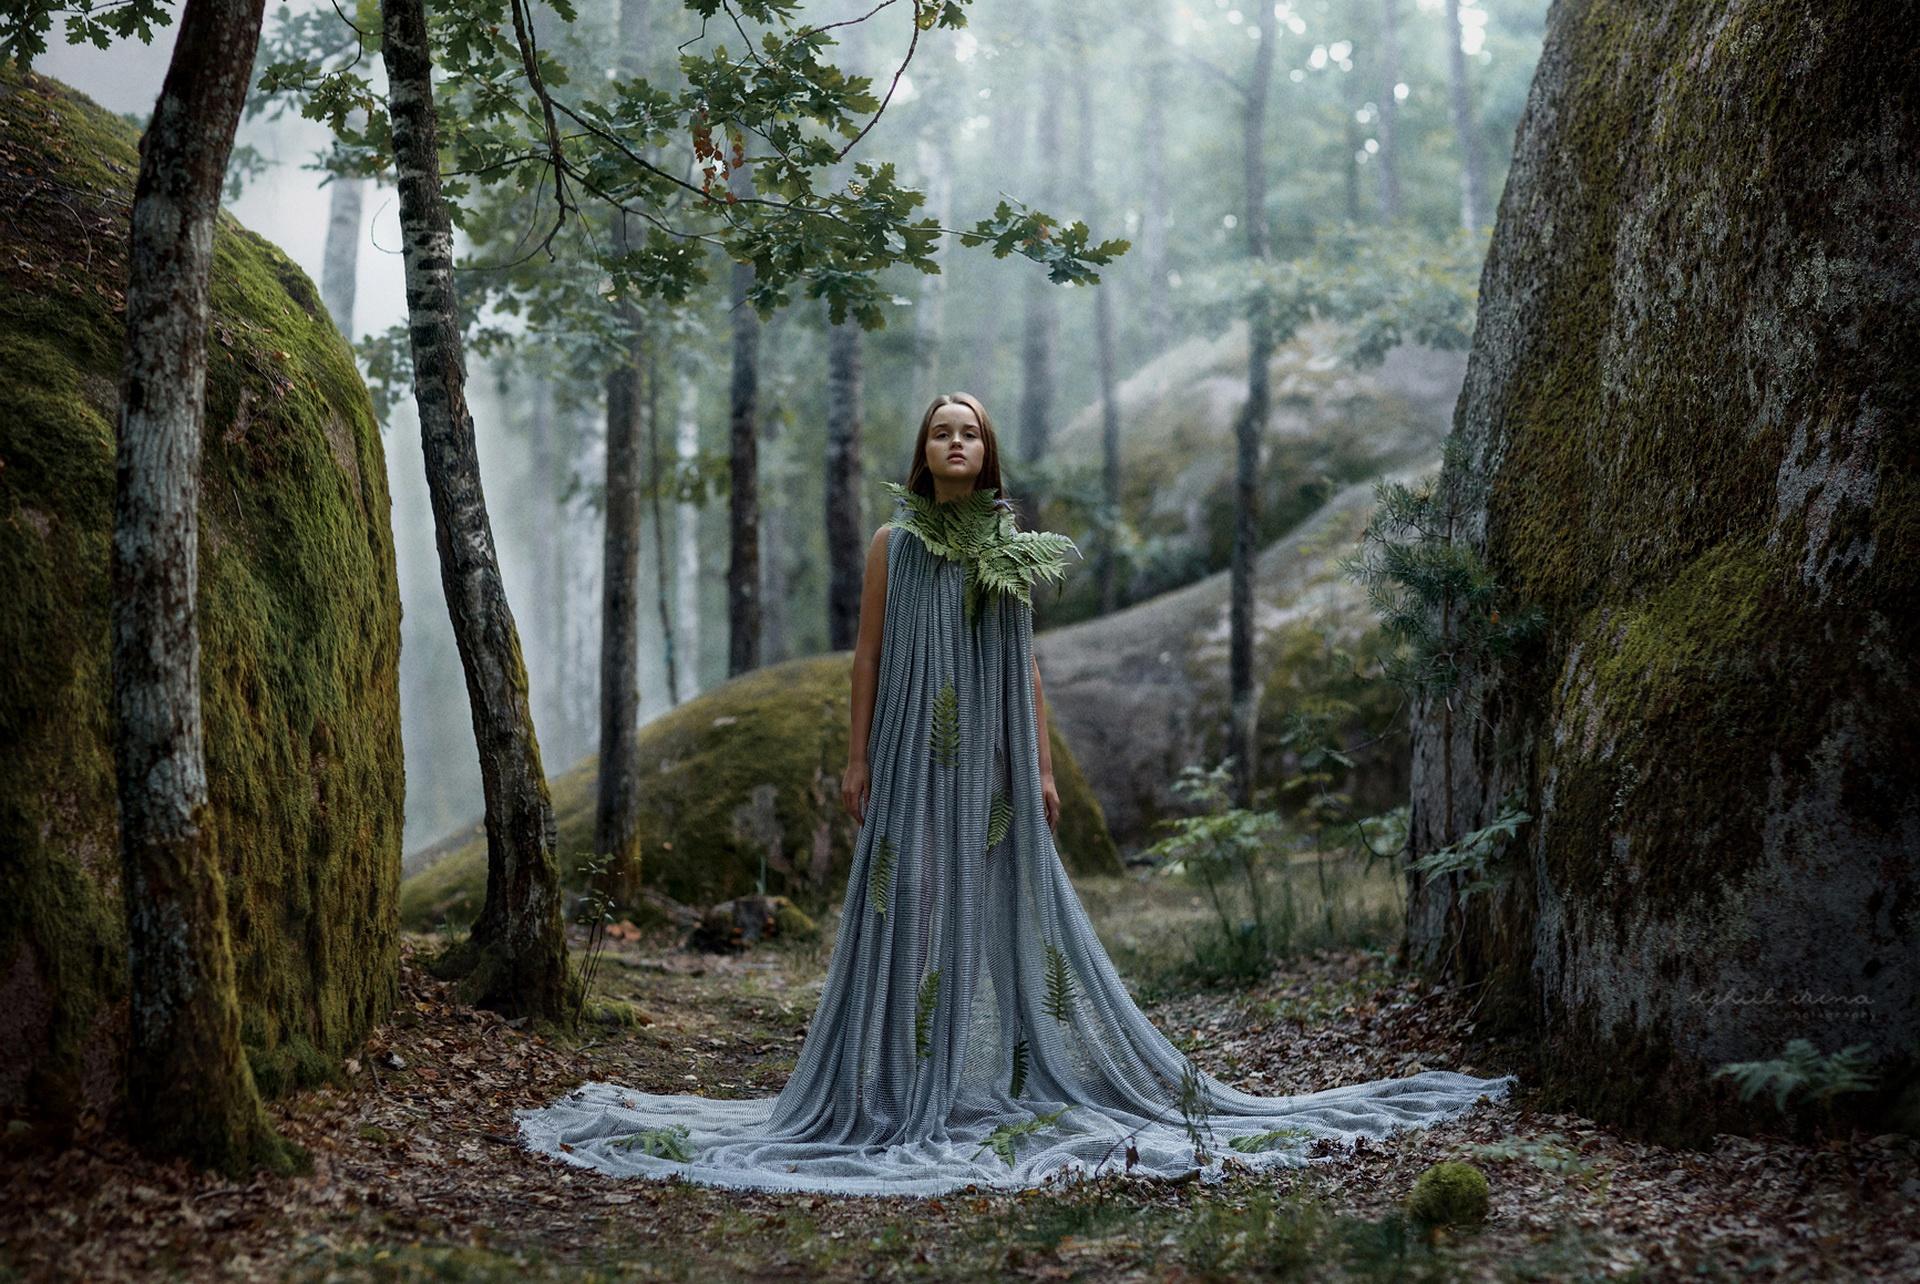 women Outdoors, Women, Model, Fantasy Art, Nature